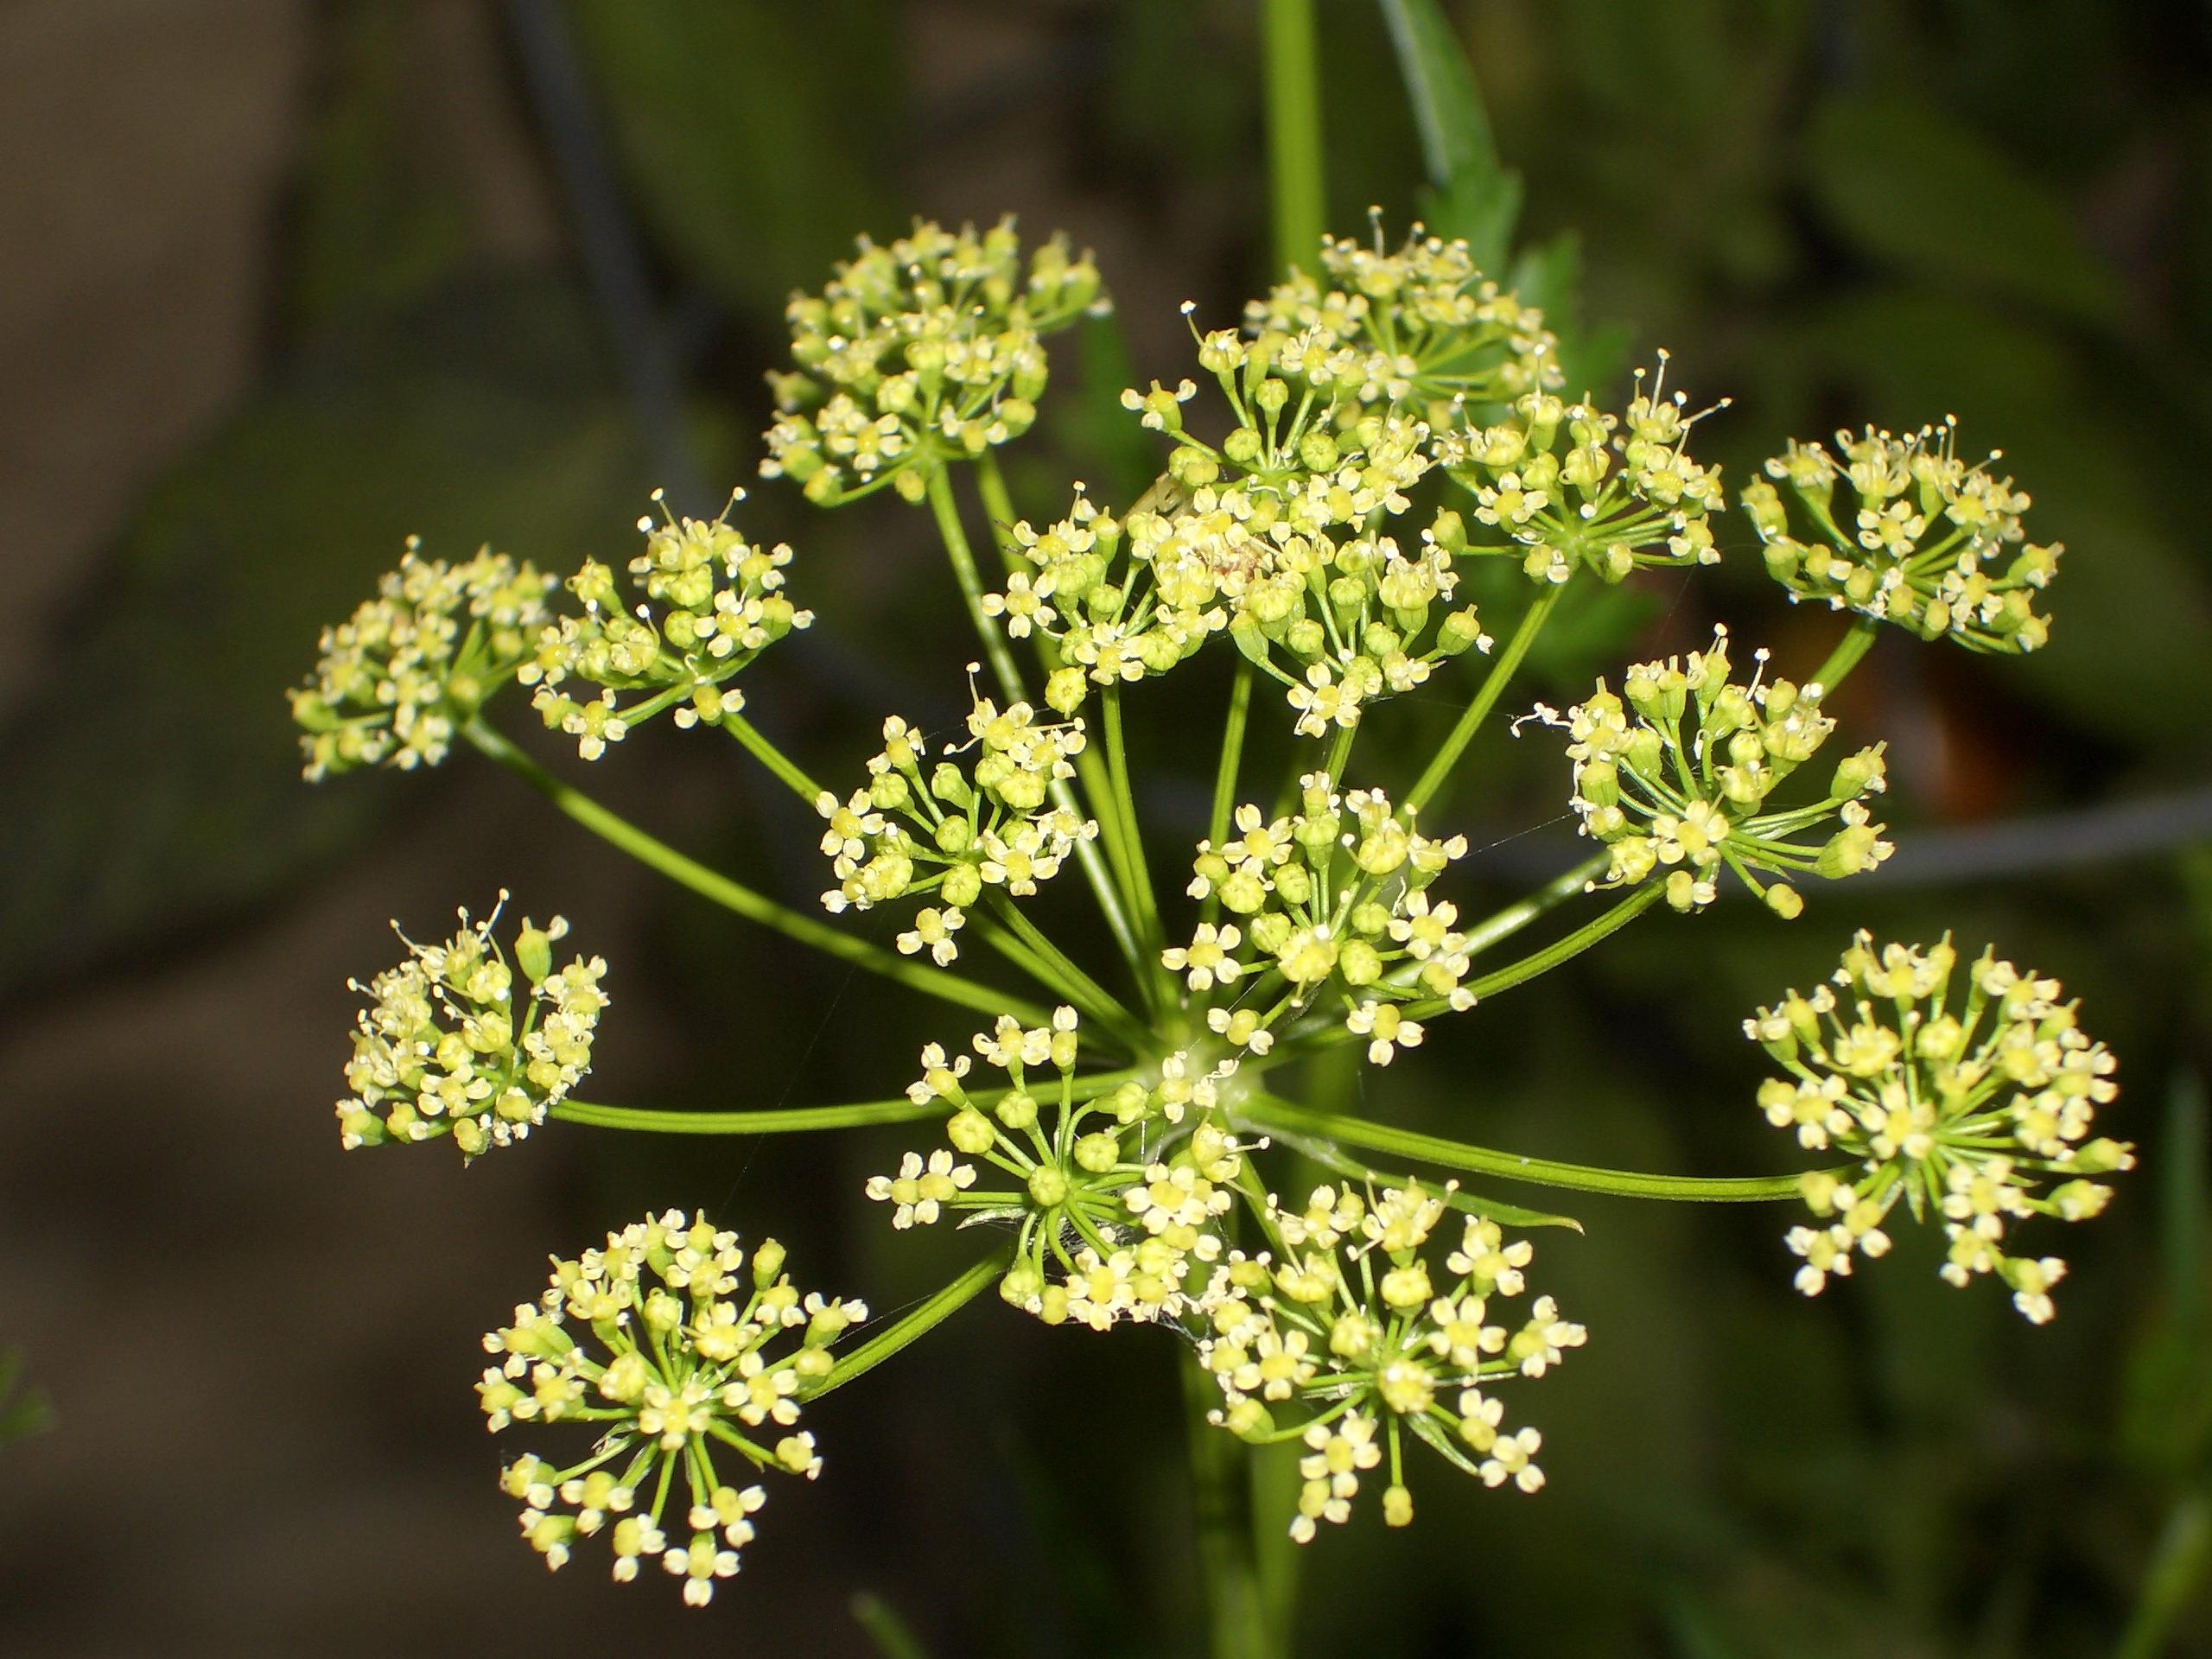 Is Parsley Leaf Or Kelp Powder As A Natural Colorant